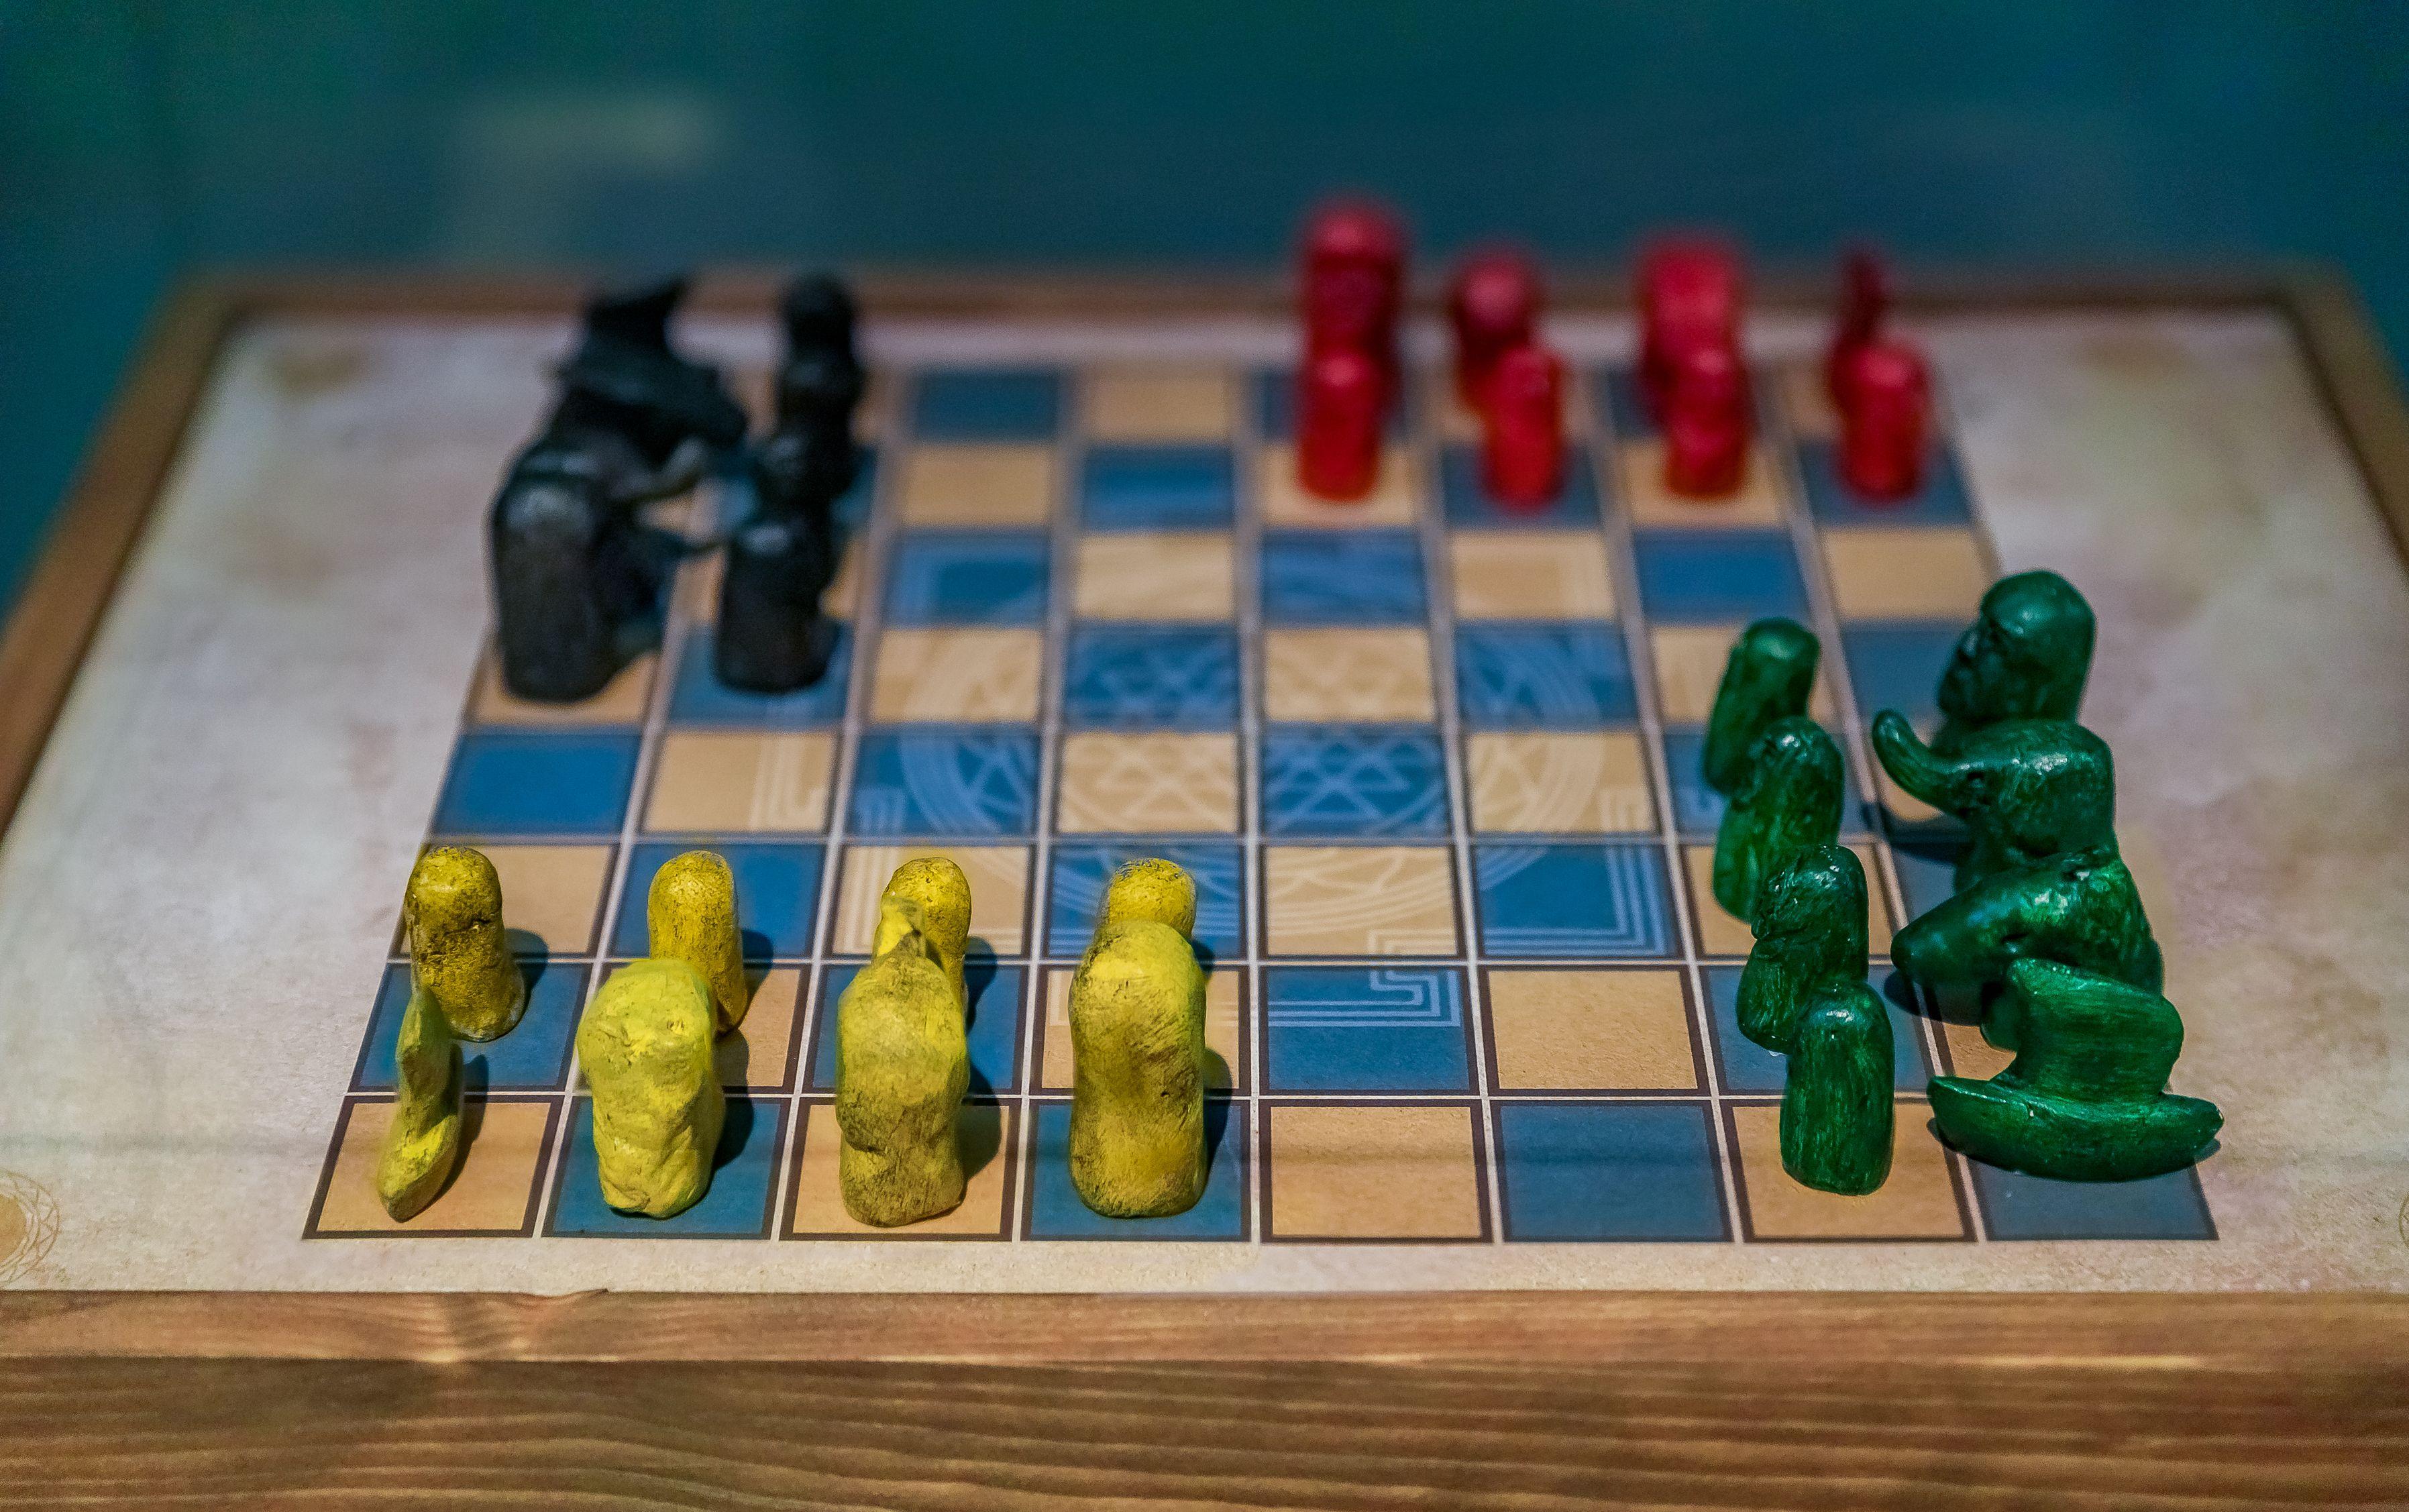 History of chess Chaturanga board